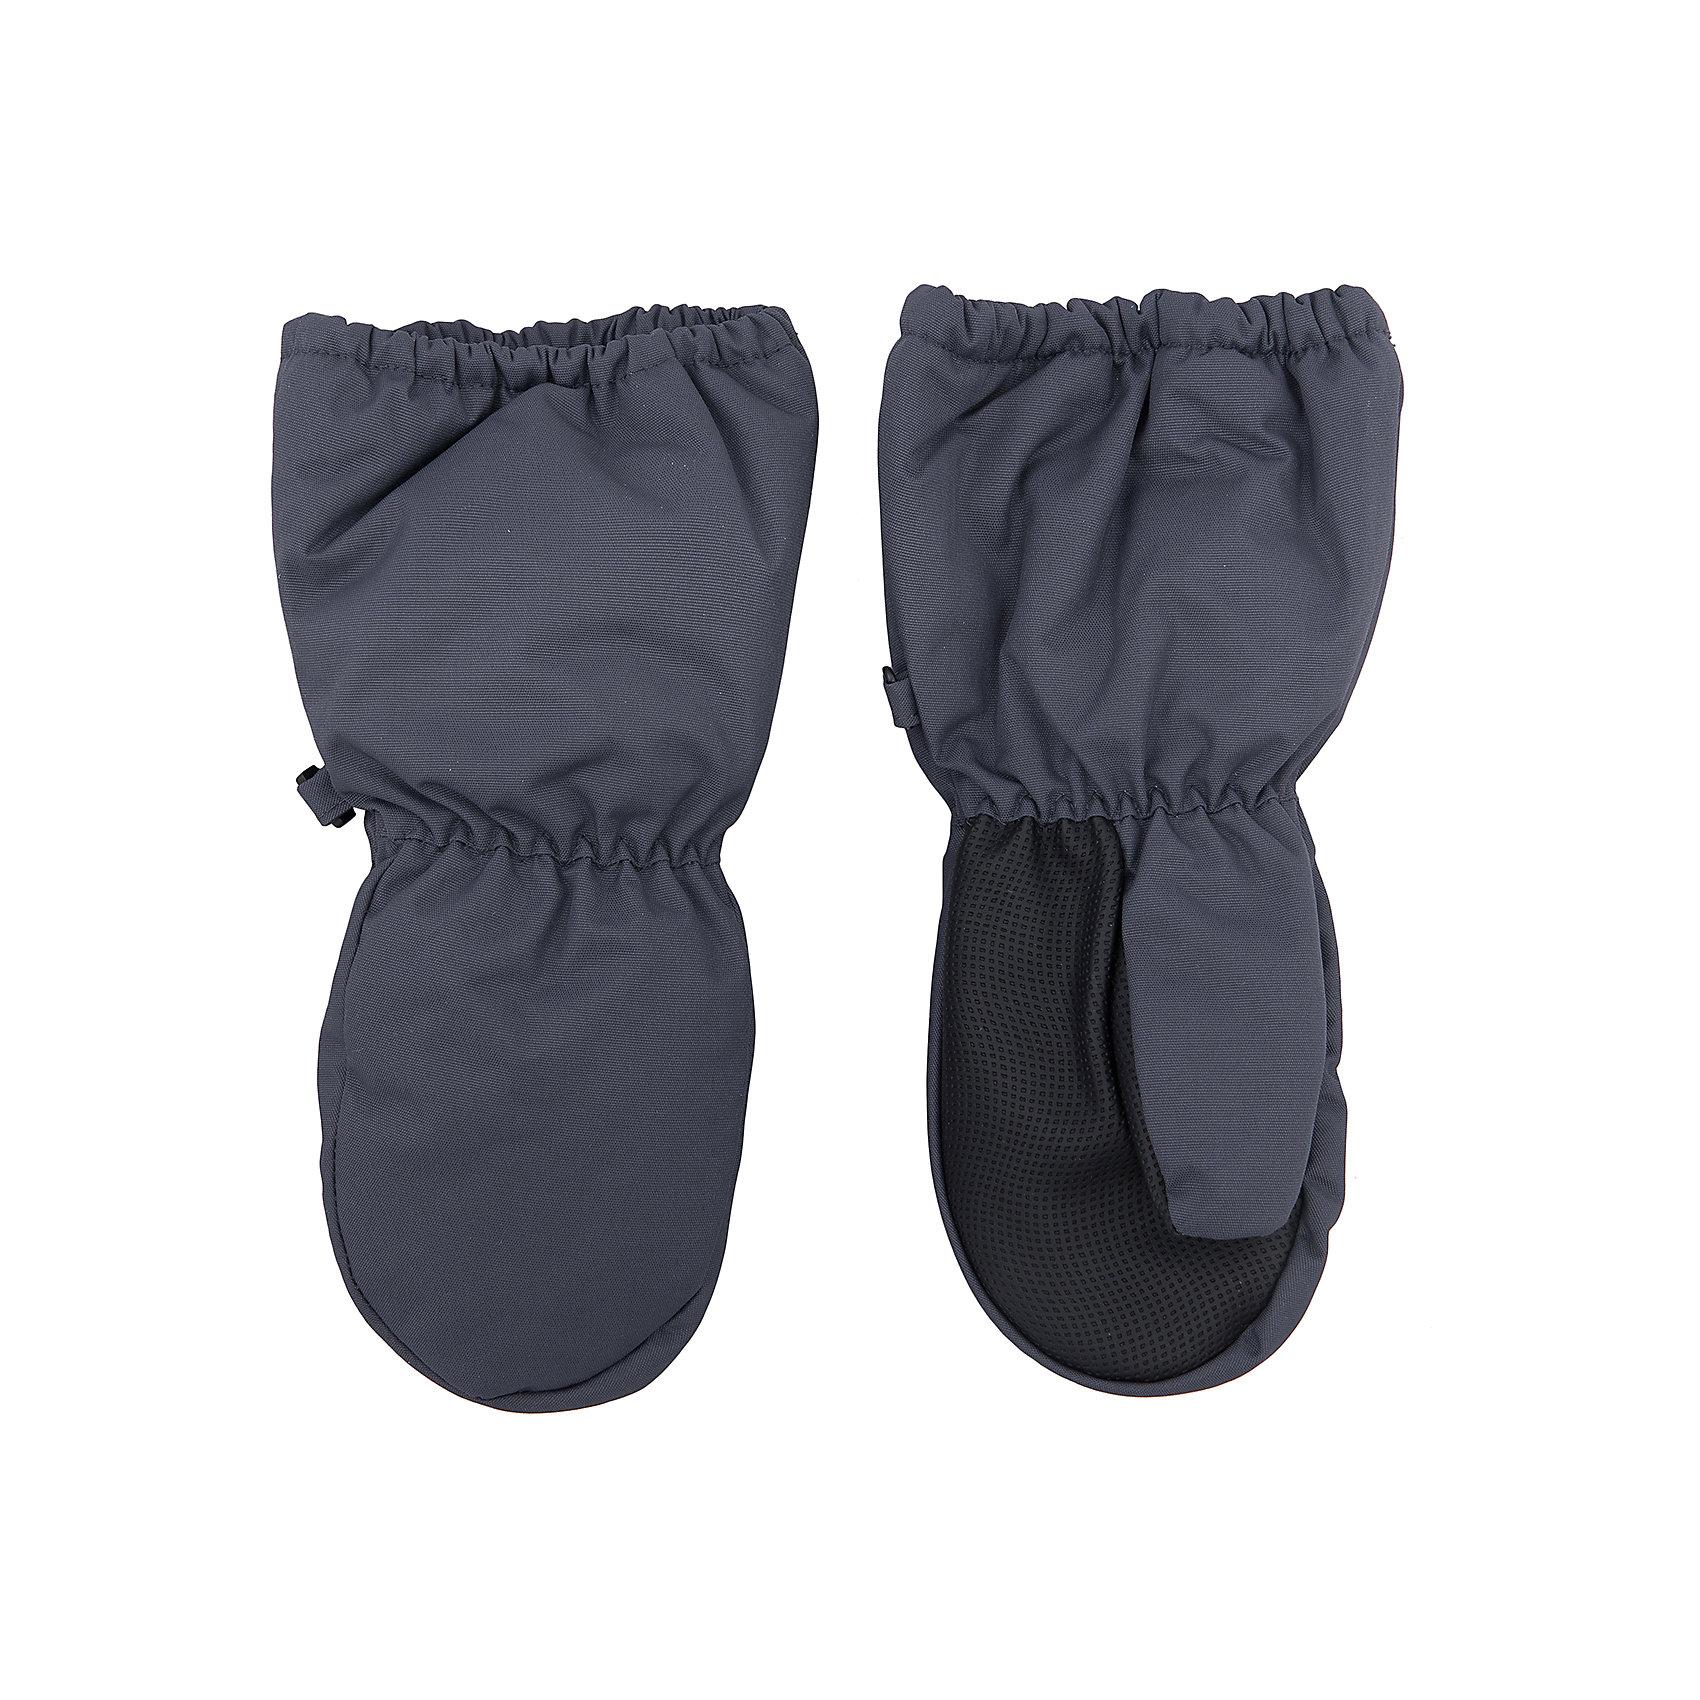 Premont Варежки для мальчика Premont салфетки для поверхностей defender cln 30103 pro 30103